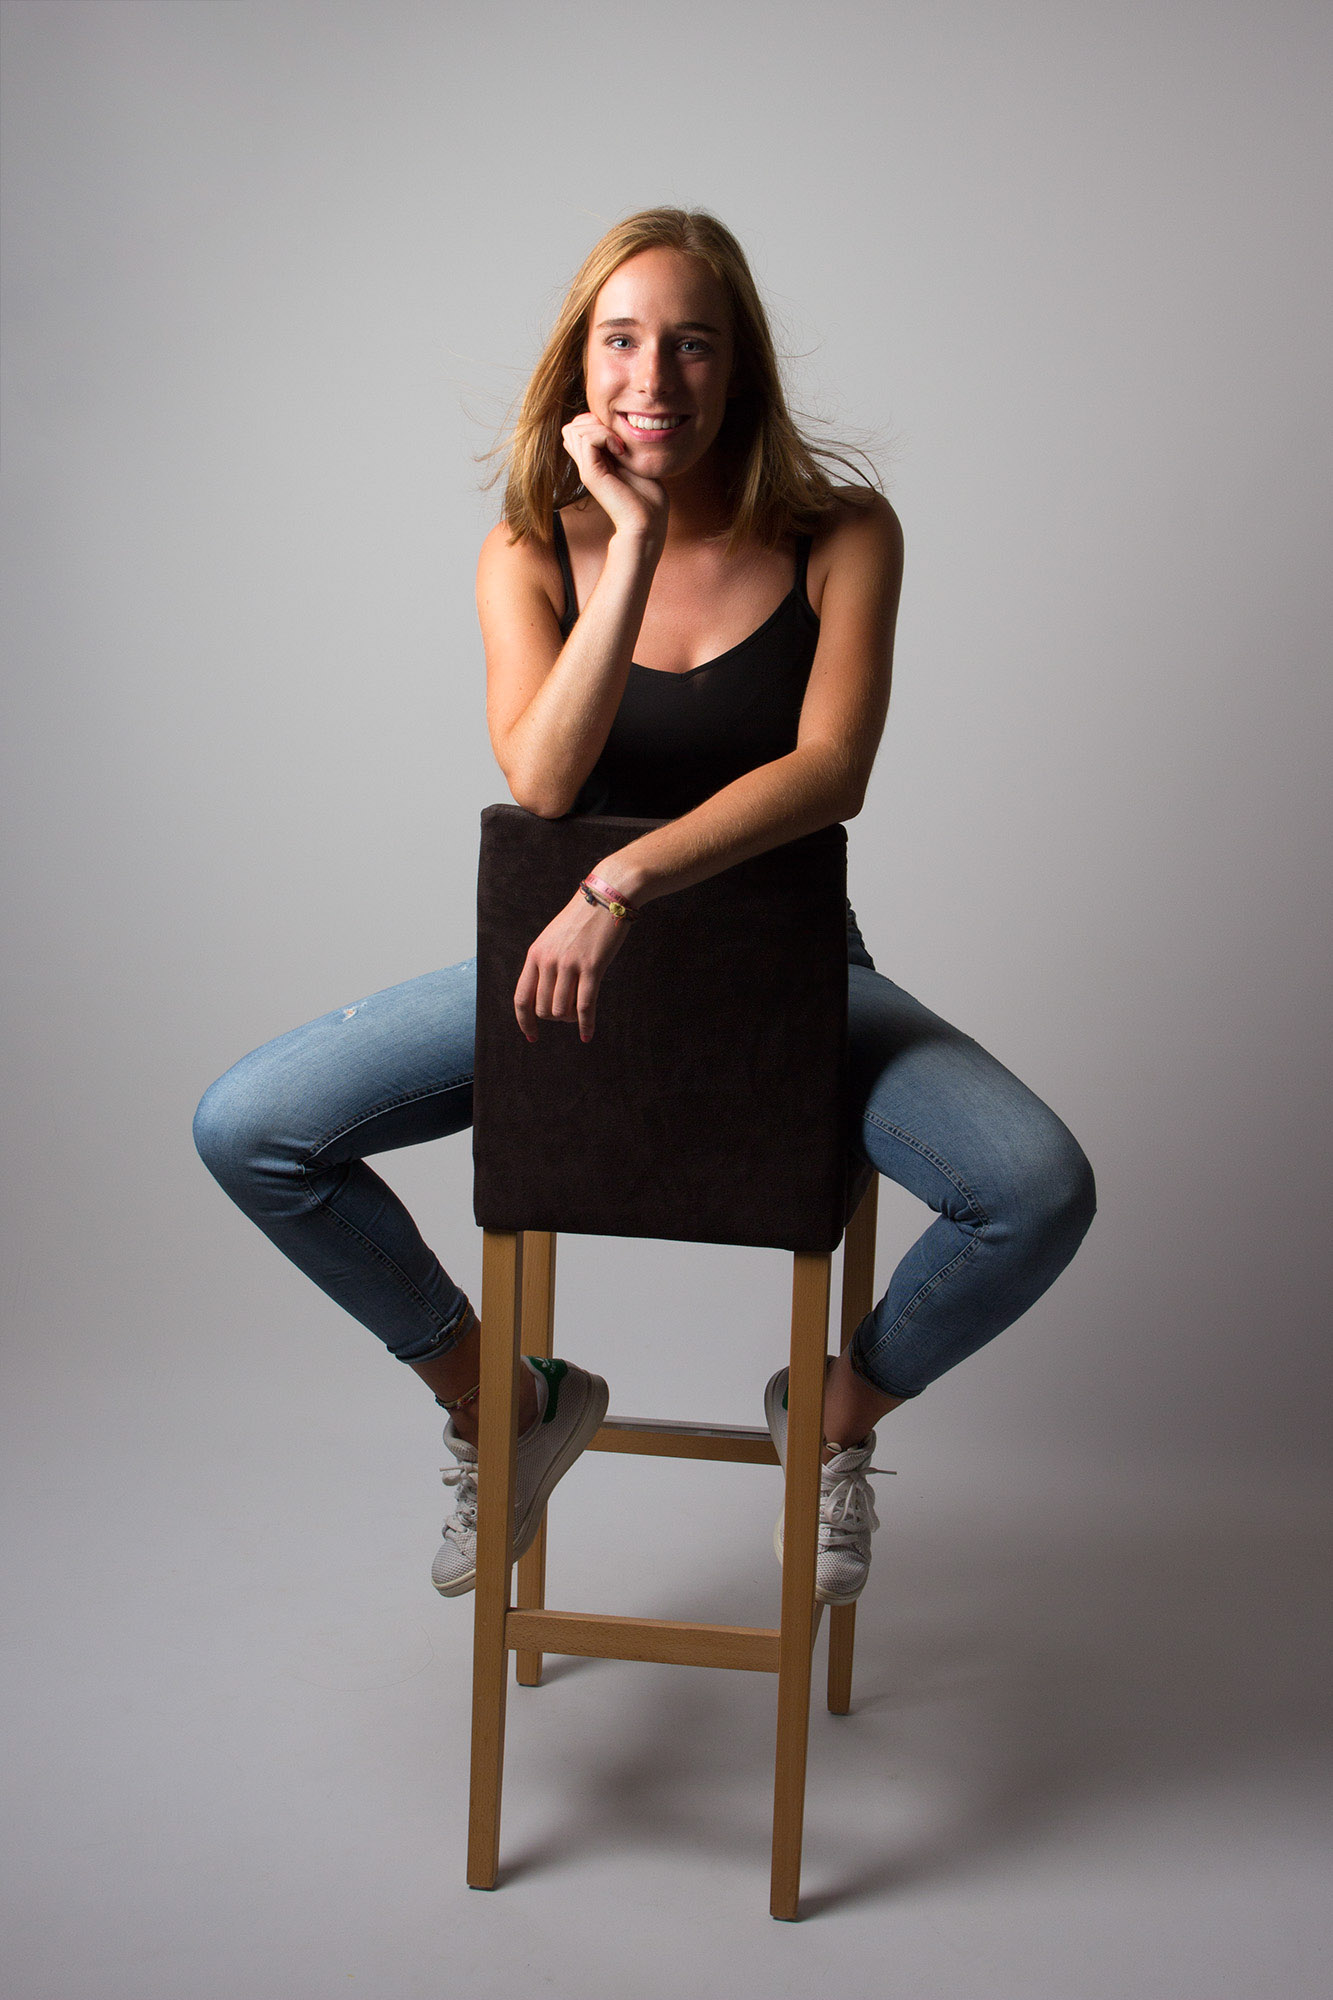 Studio portret fotografie